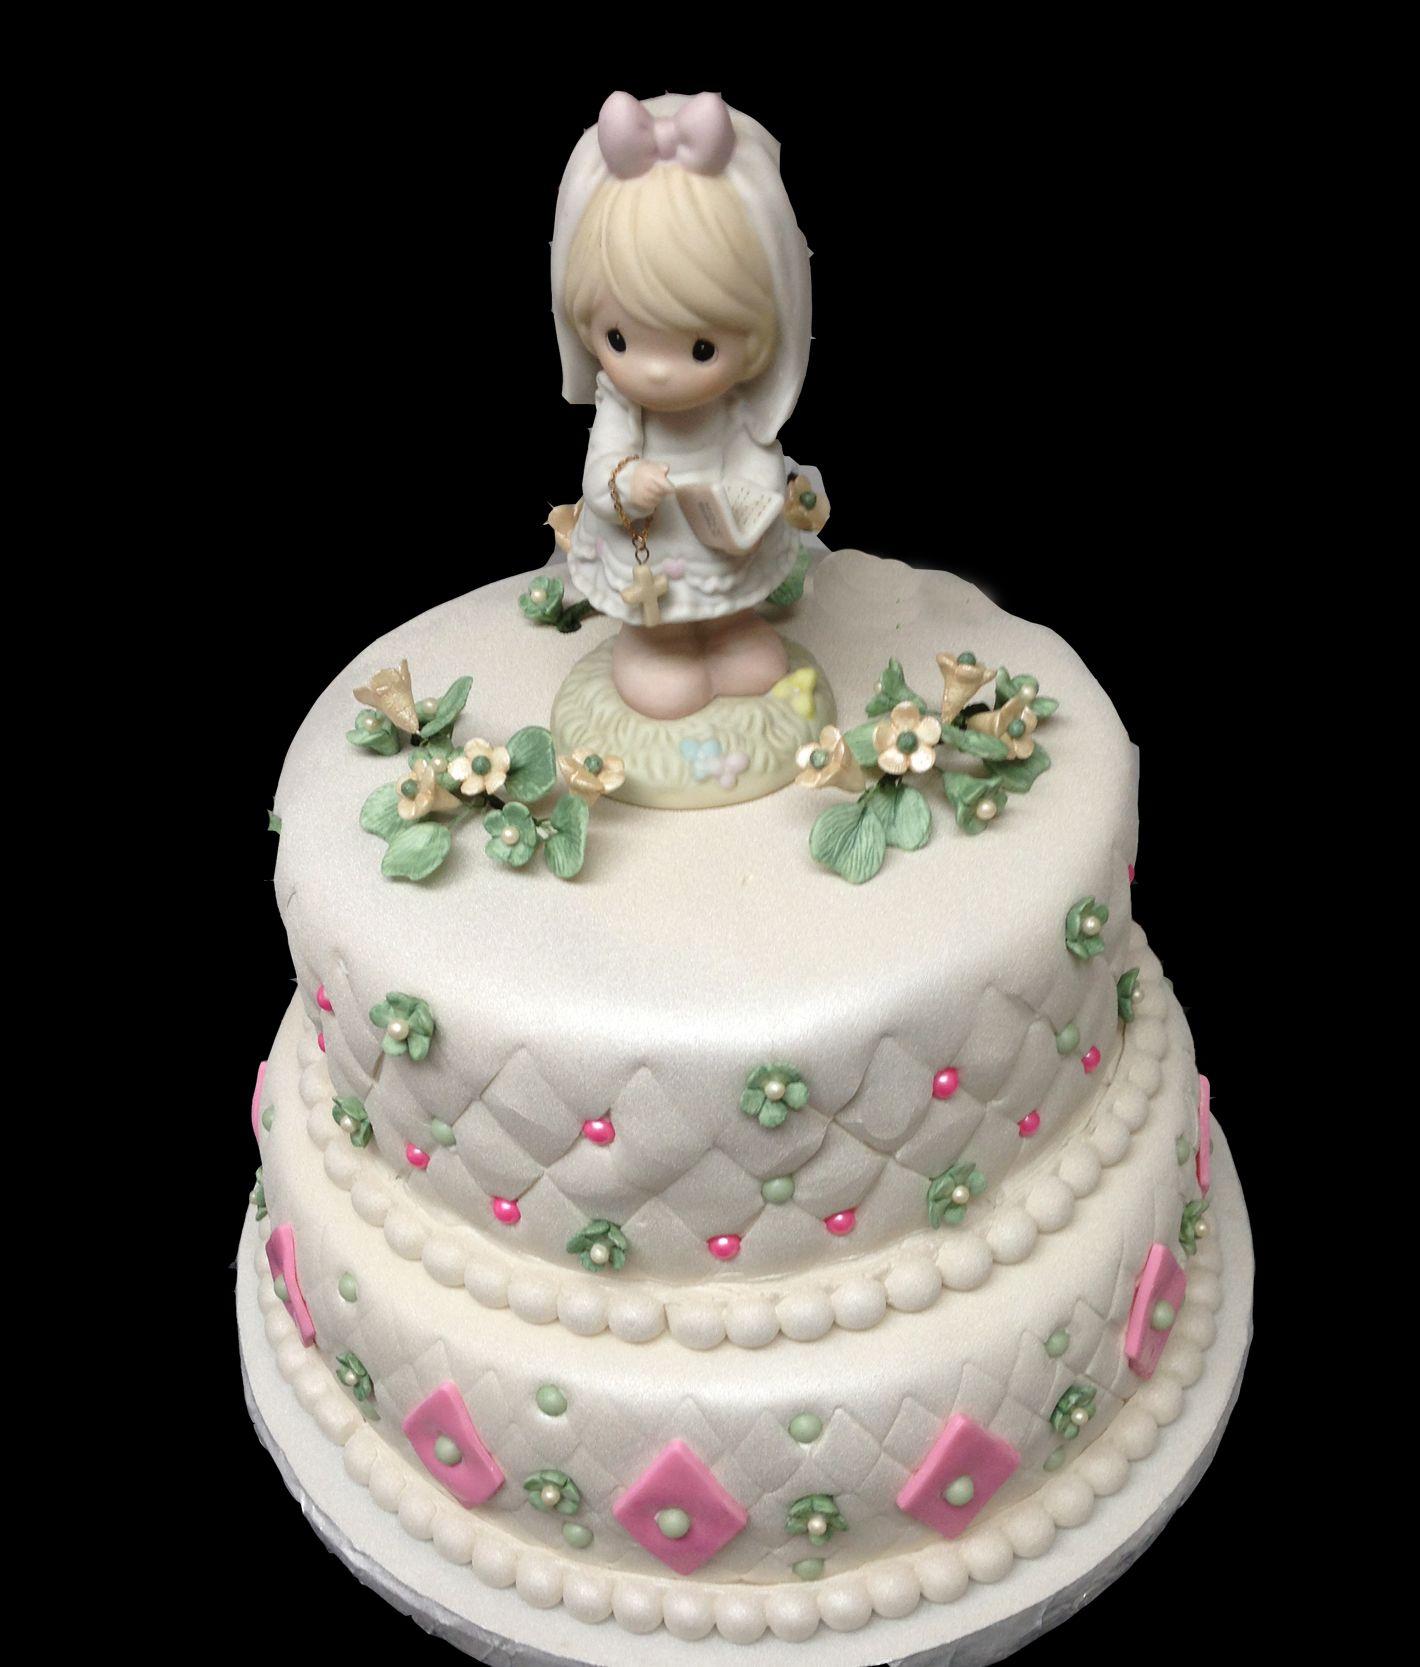 SWEET DREAMZ DELIGHTS OF MIAMI COMMUNION CAKE http://www.sweetdreamzdelights.com